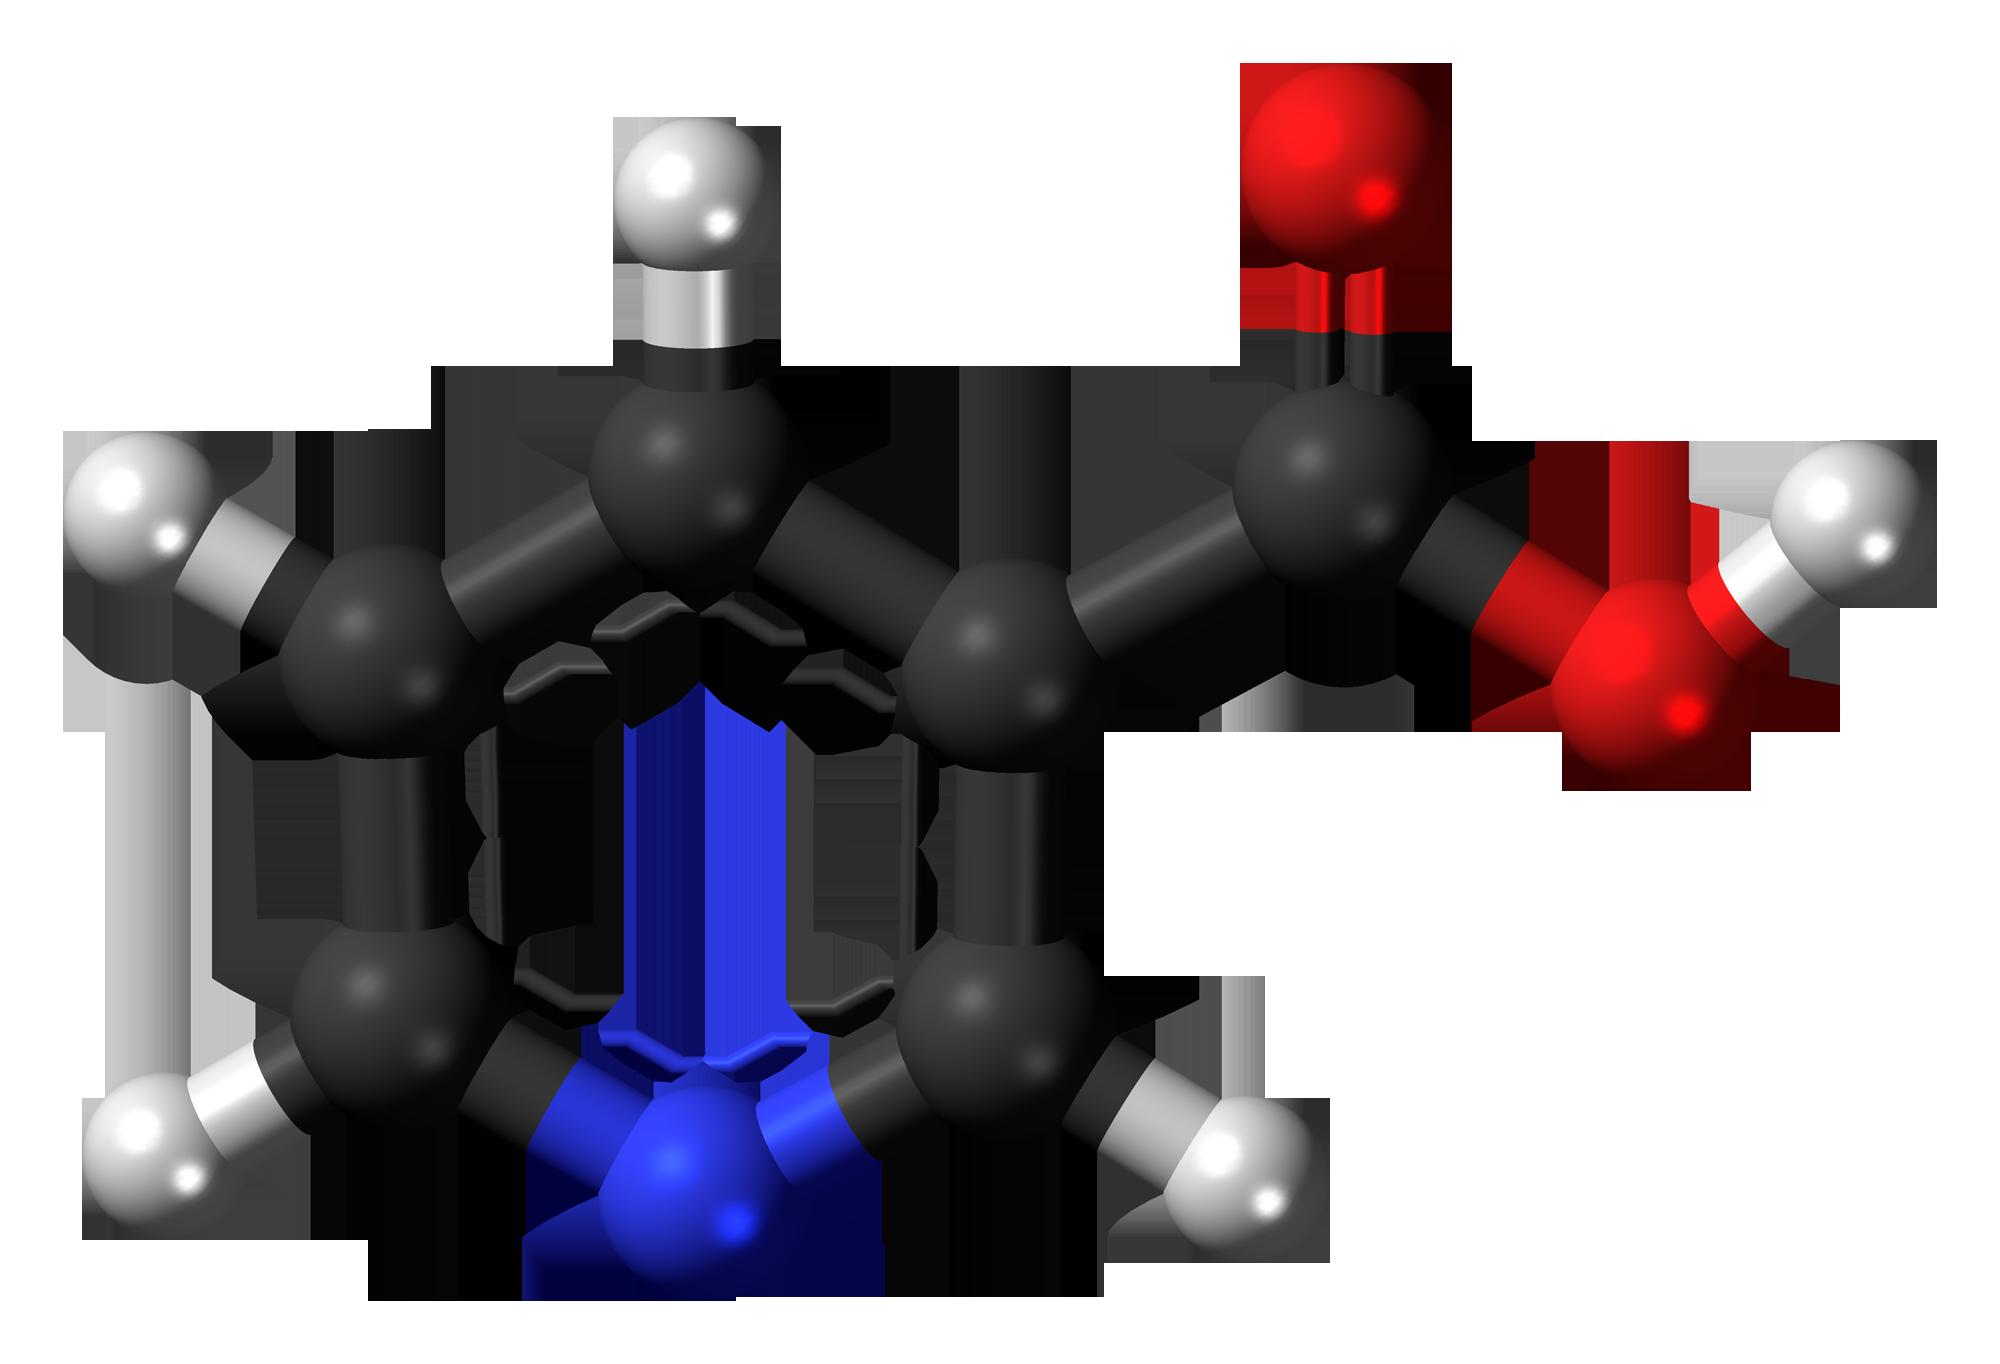 File:Niacin-3D-balls.png - Wikimedia Commons